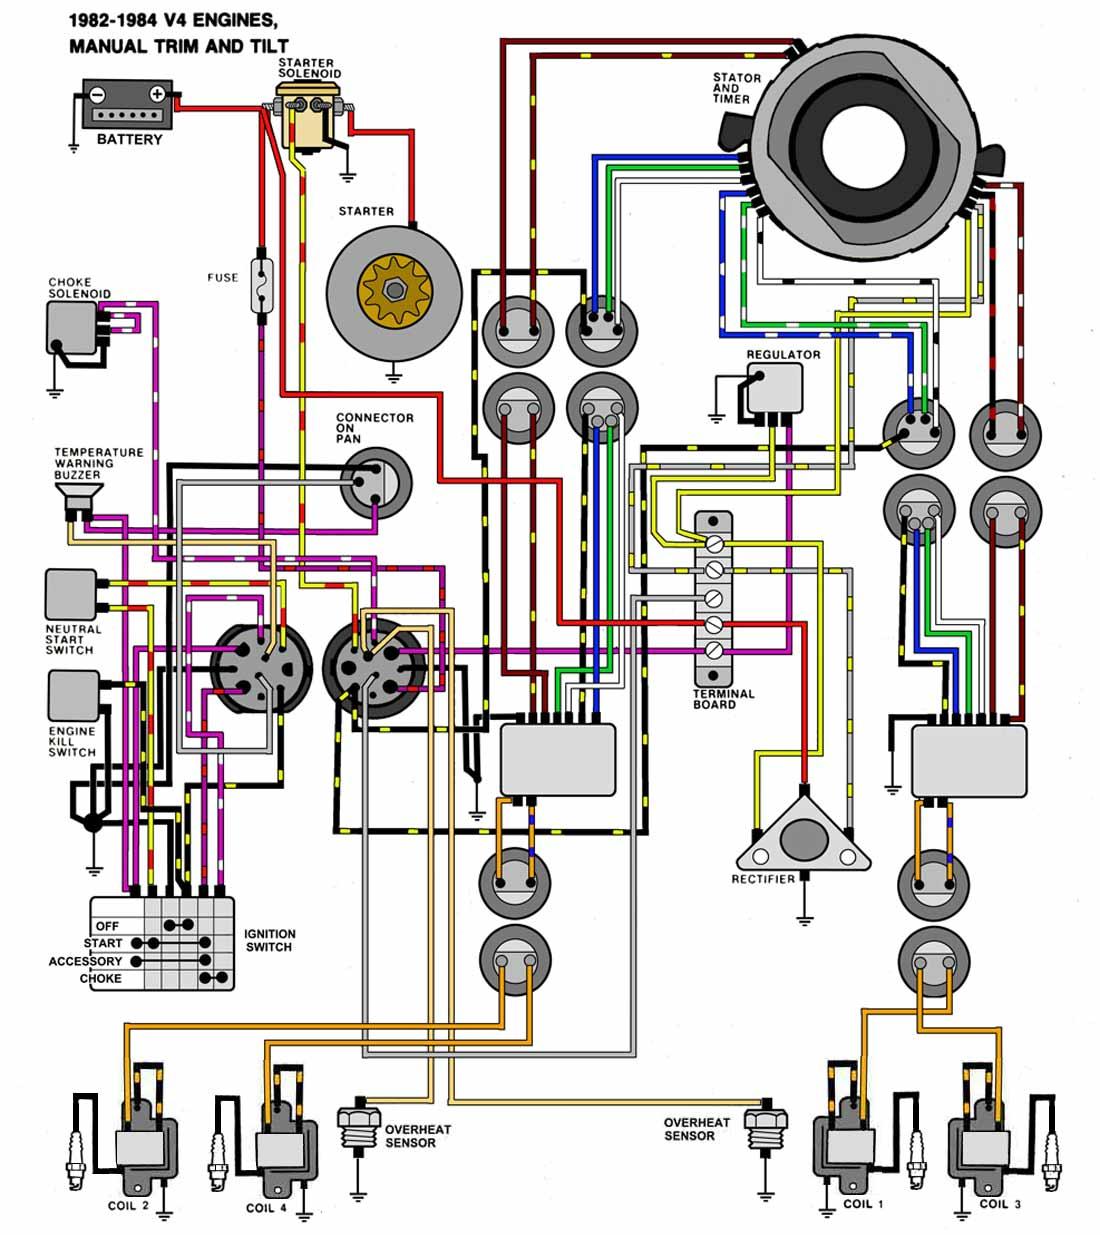 omc 4 3 wiring diagram